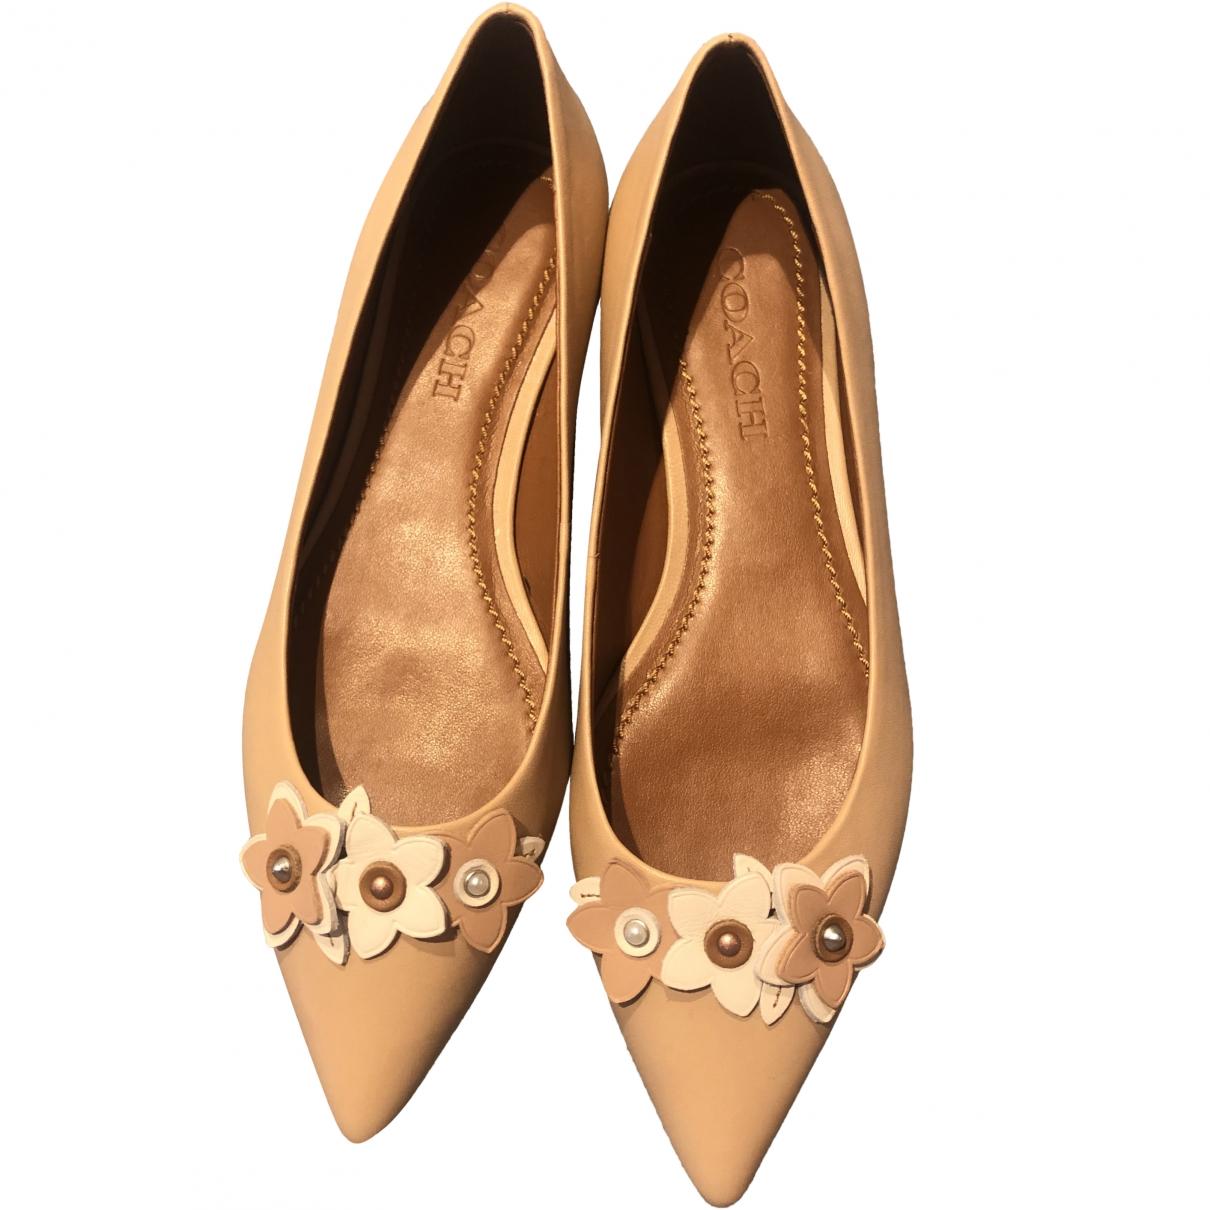 Coach \N Beige Leather Ballet flats for Women 7.5 US